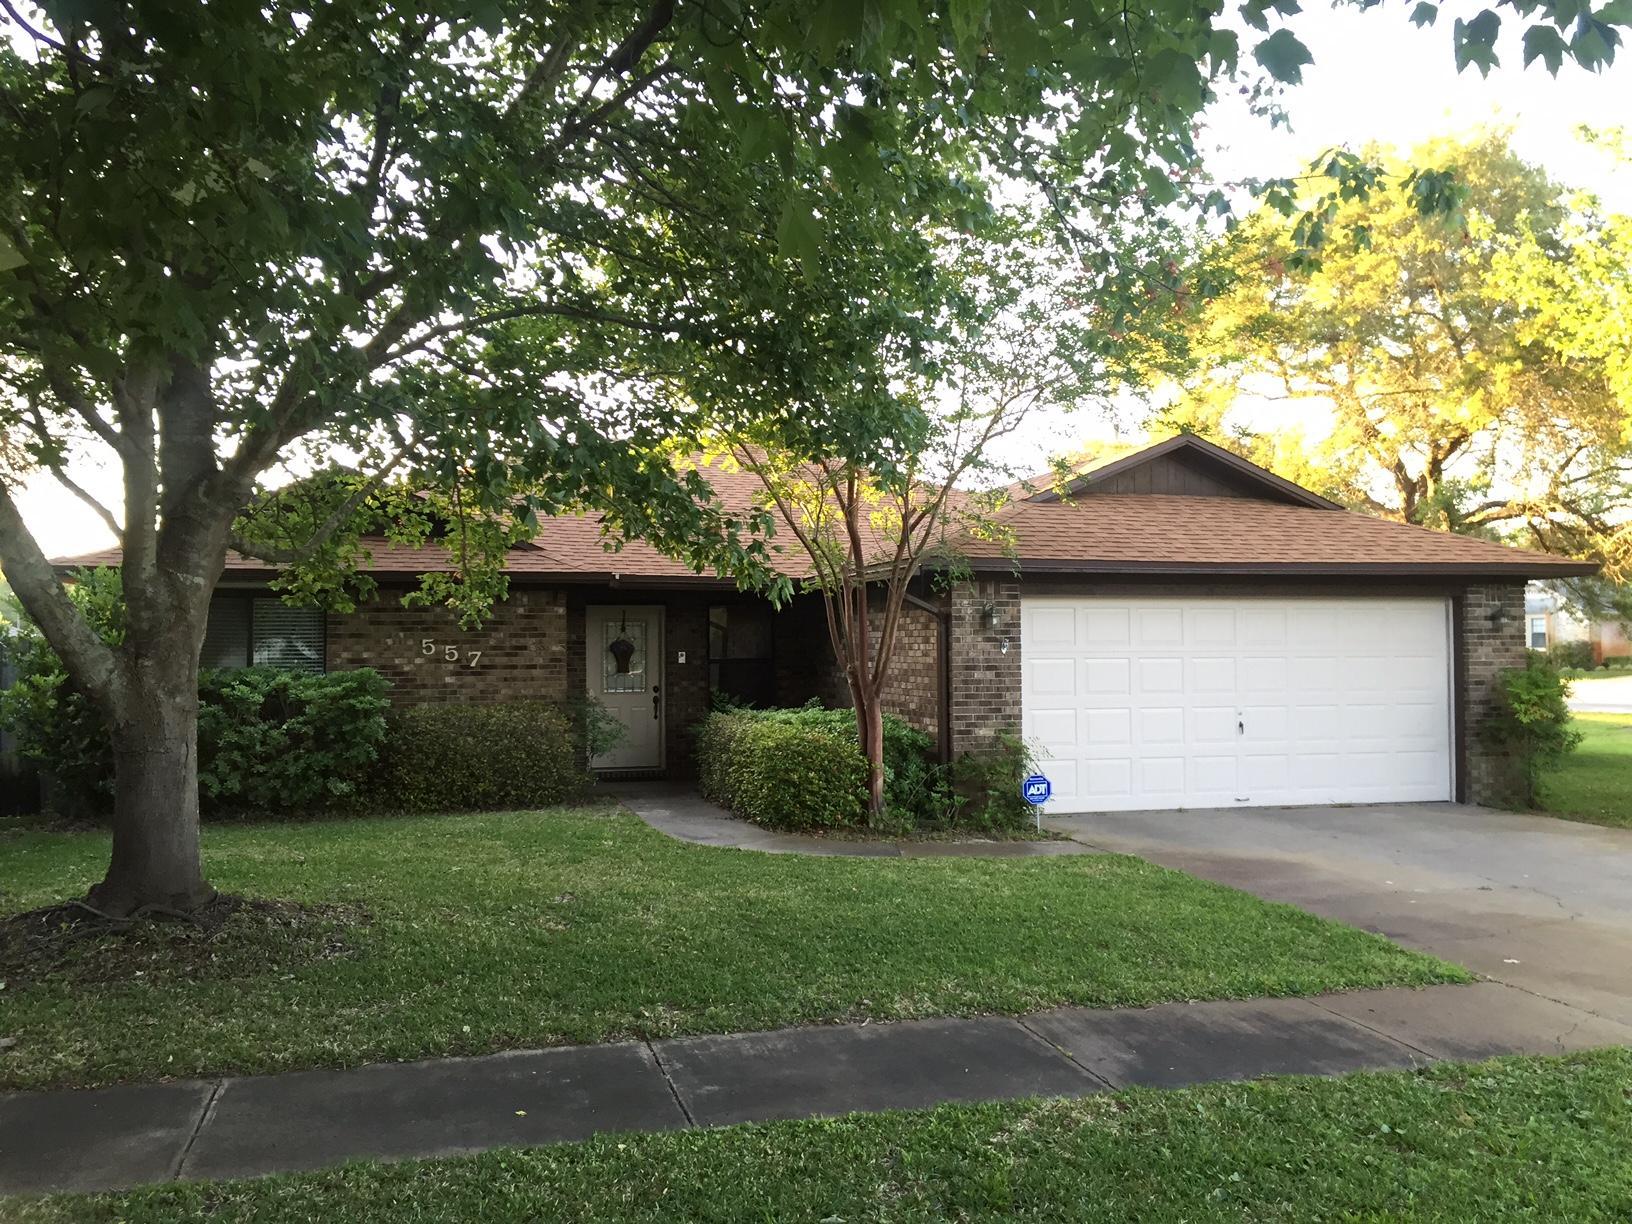 Photo of home for sale at 557 Sibert, Destin FL